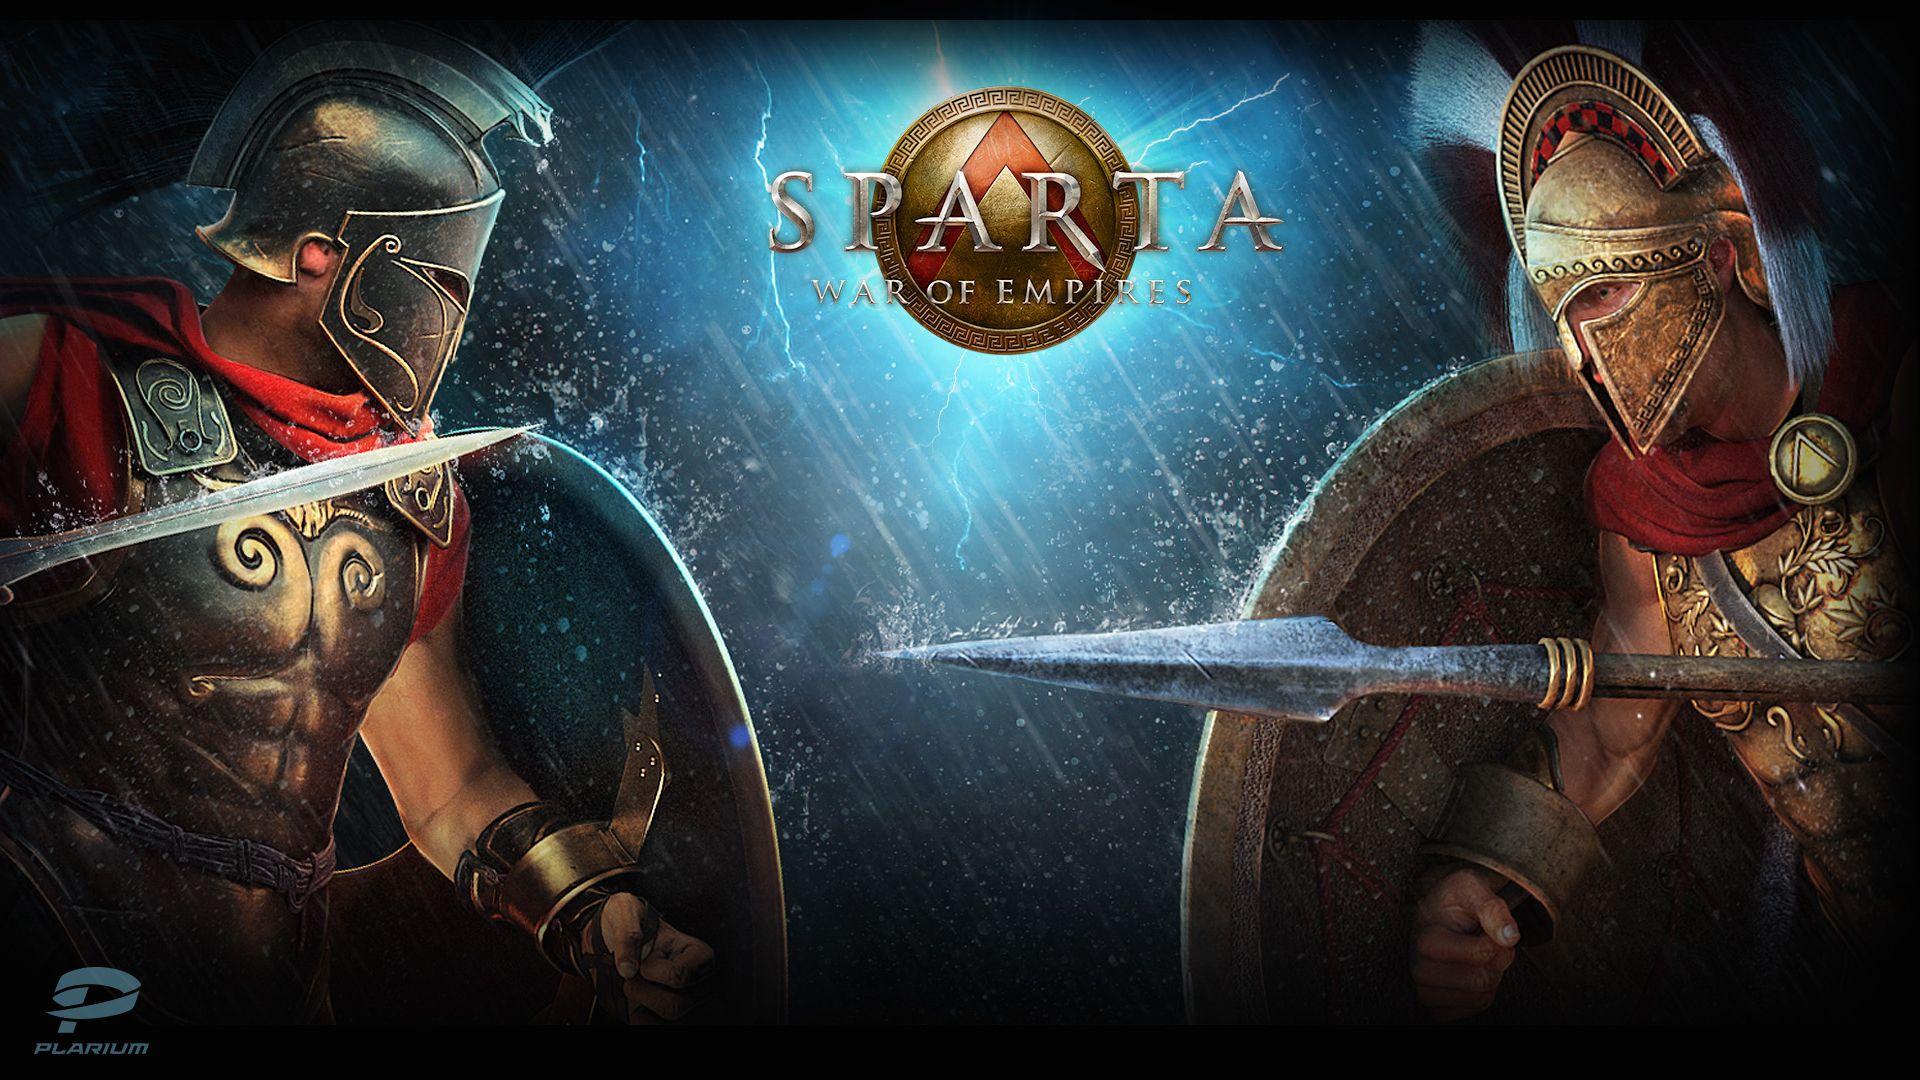 Star Trek kostenlos spielen | Online-Slot.de